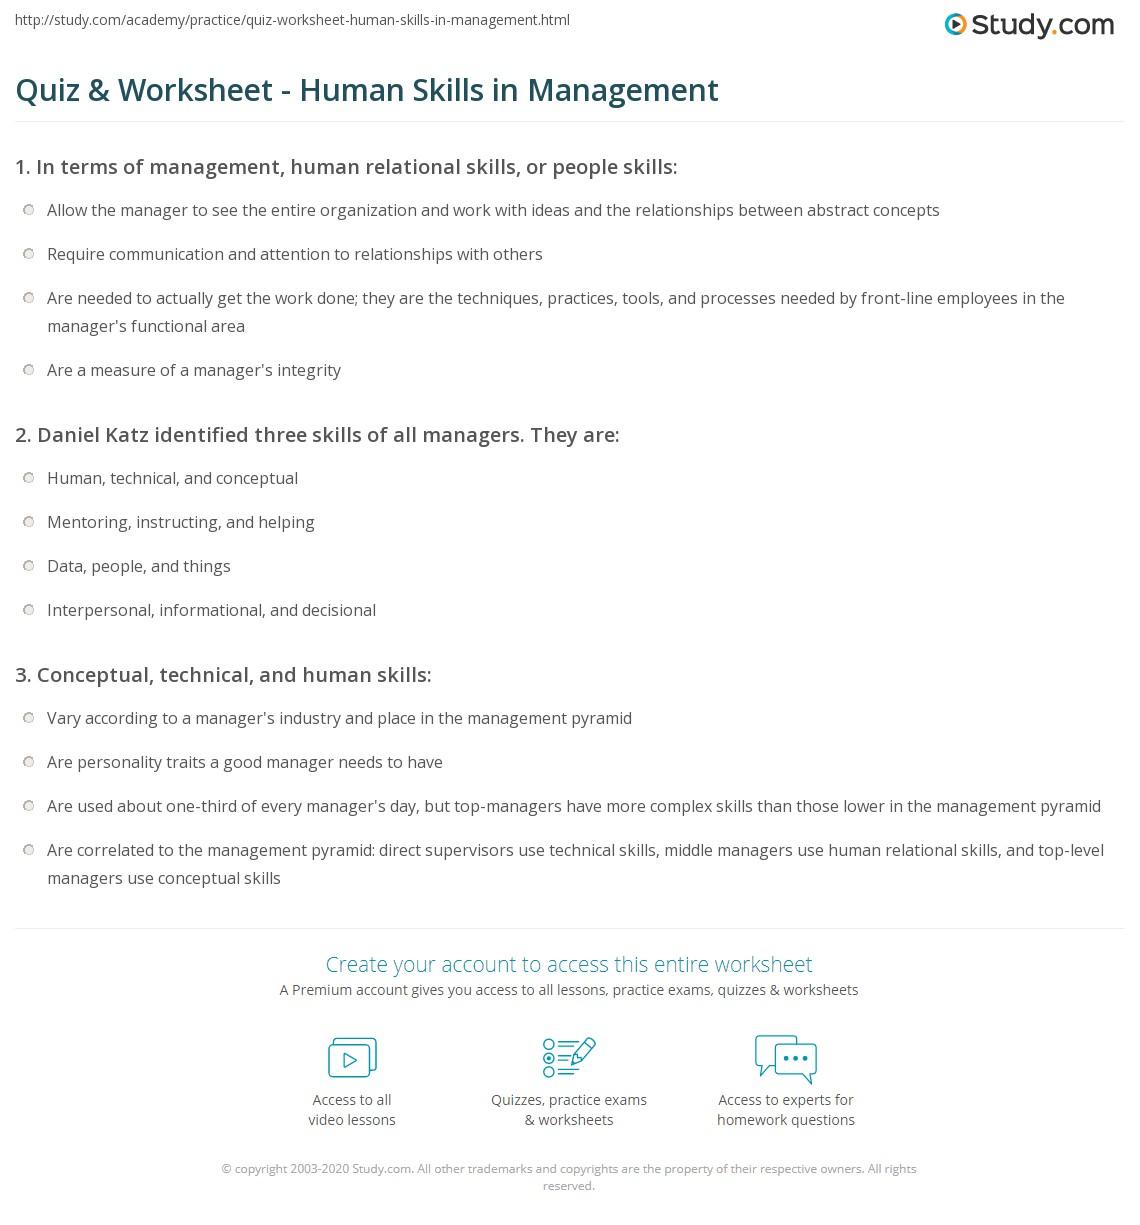 Quiz & Worksheet - Human Skills in Management | Study com